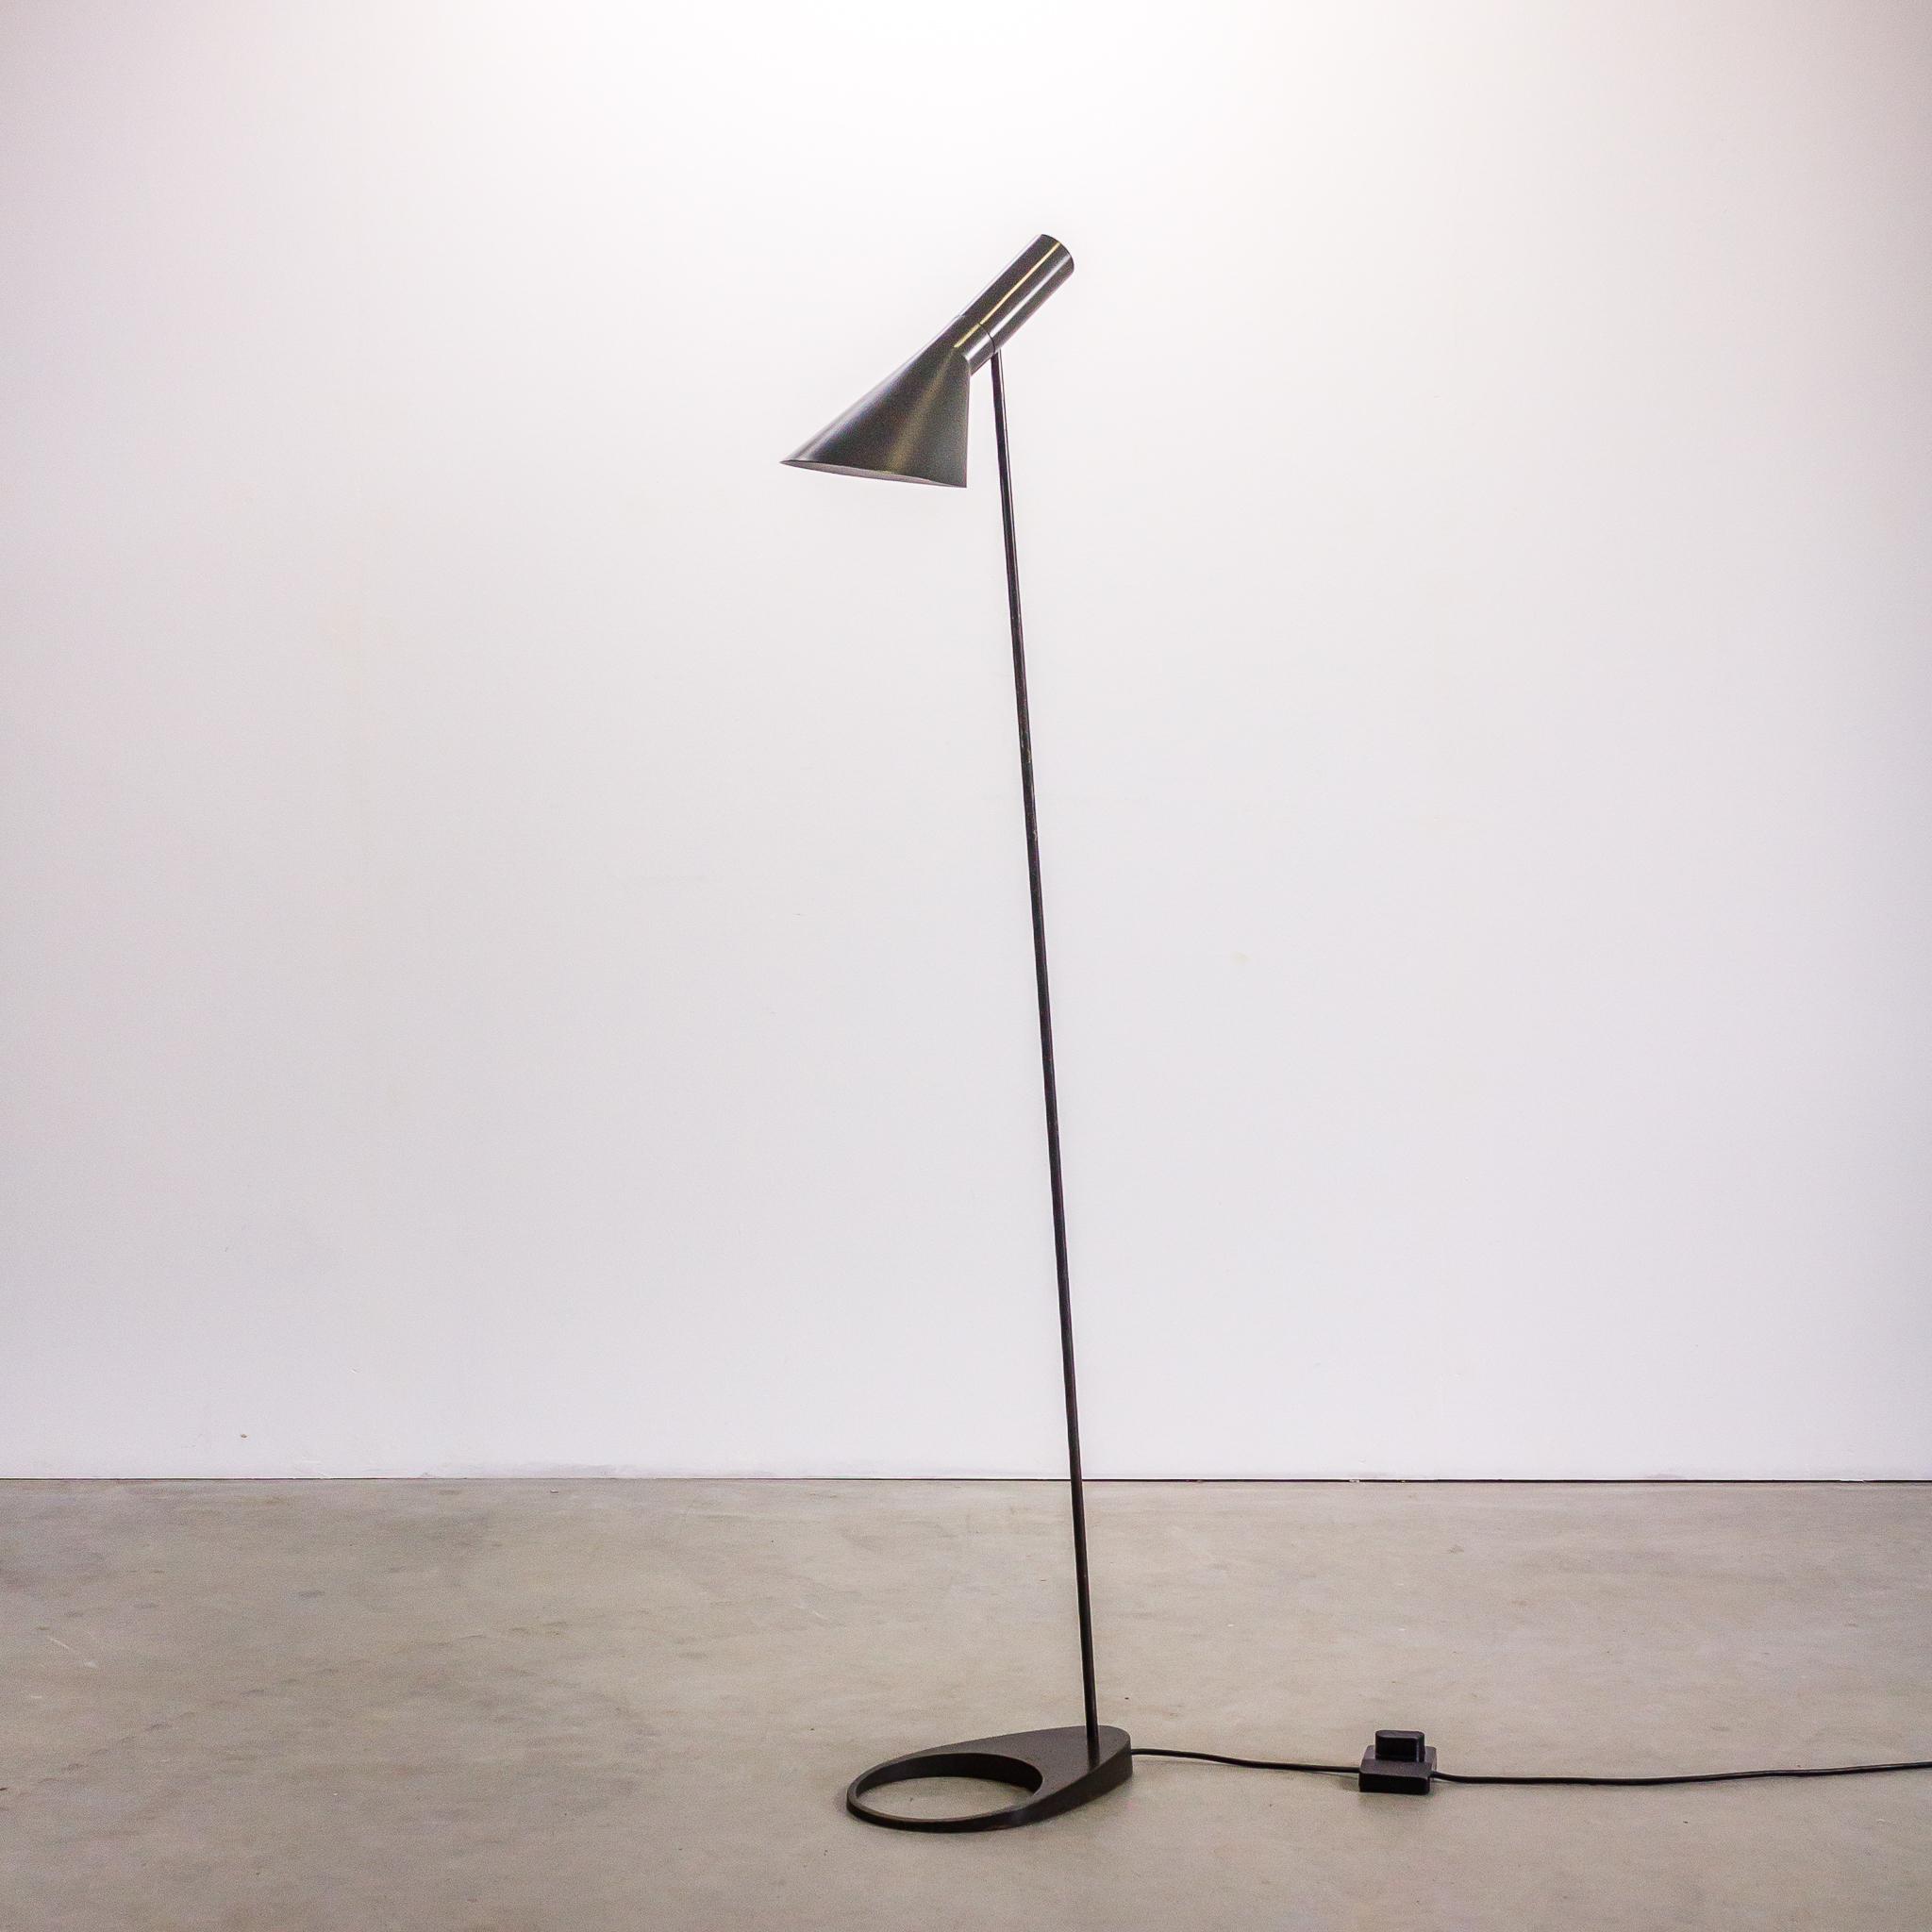 60 S Arne Jacobson Vloerlamp By Louis Poulsen Barbmama